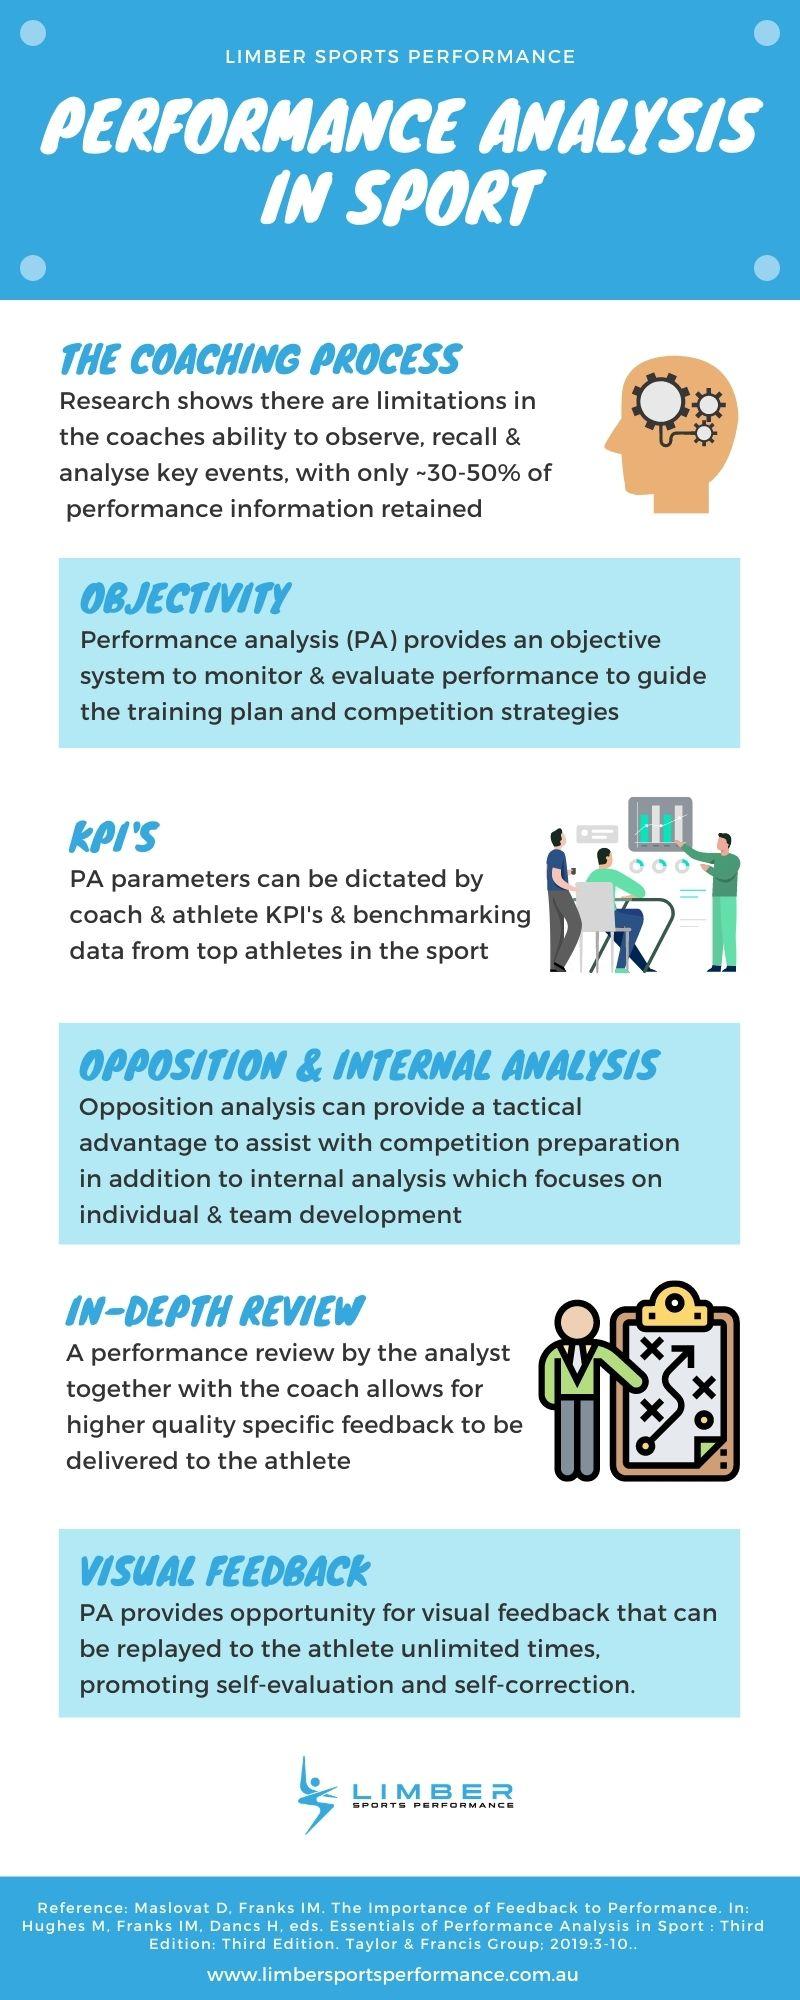 Performance Analysis in Sport